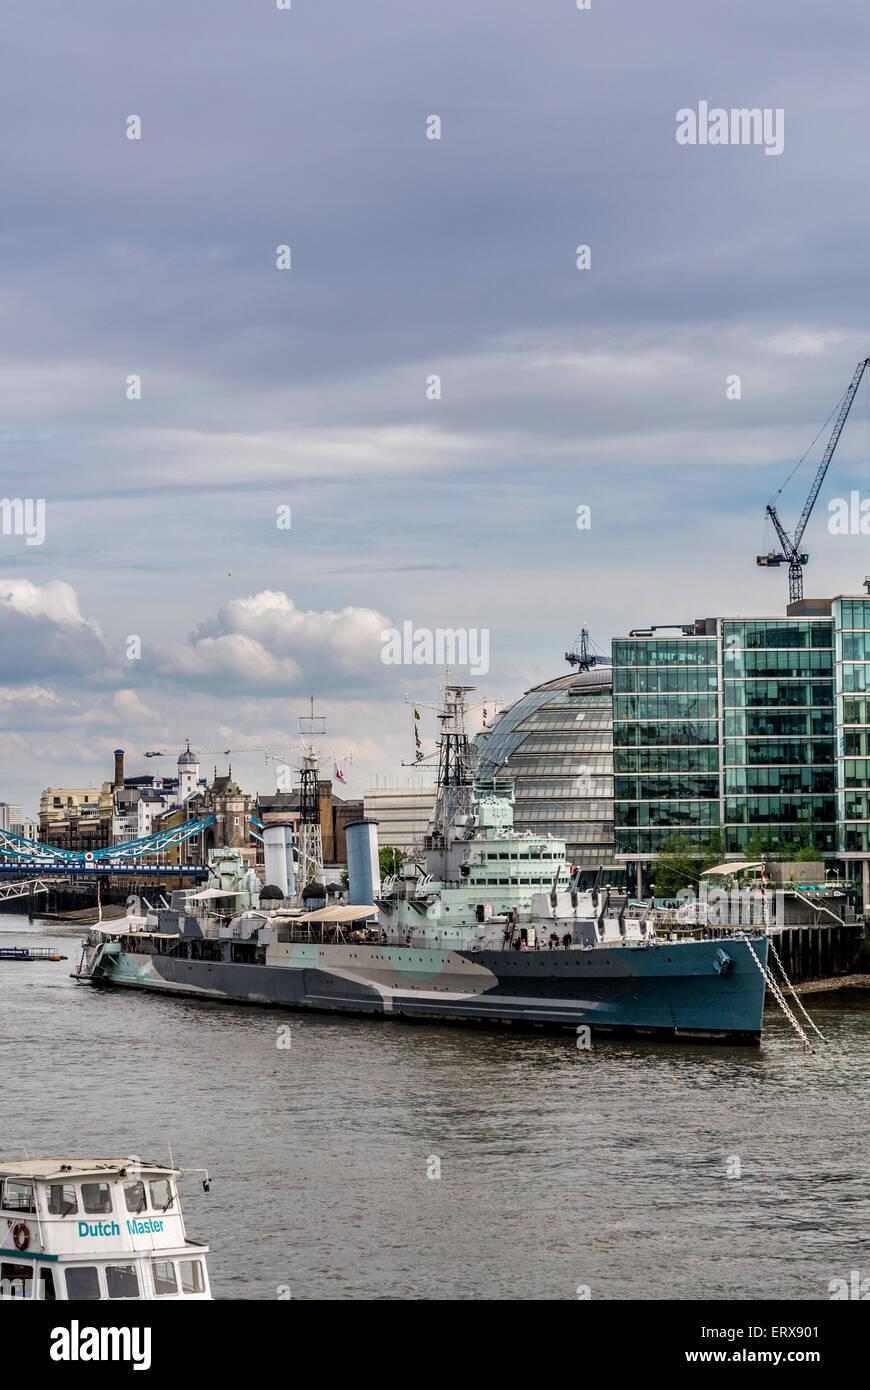 HMS Belfast on the River Thames, London, UK. - Stock Image